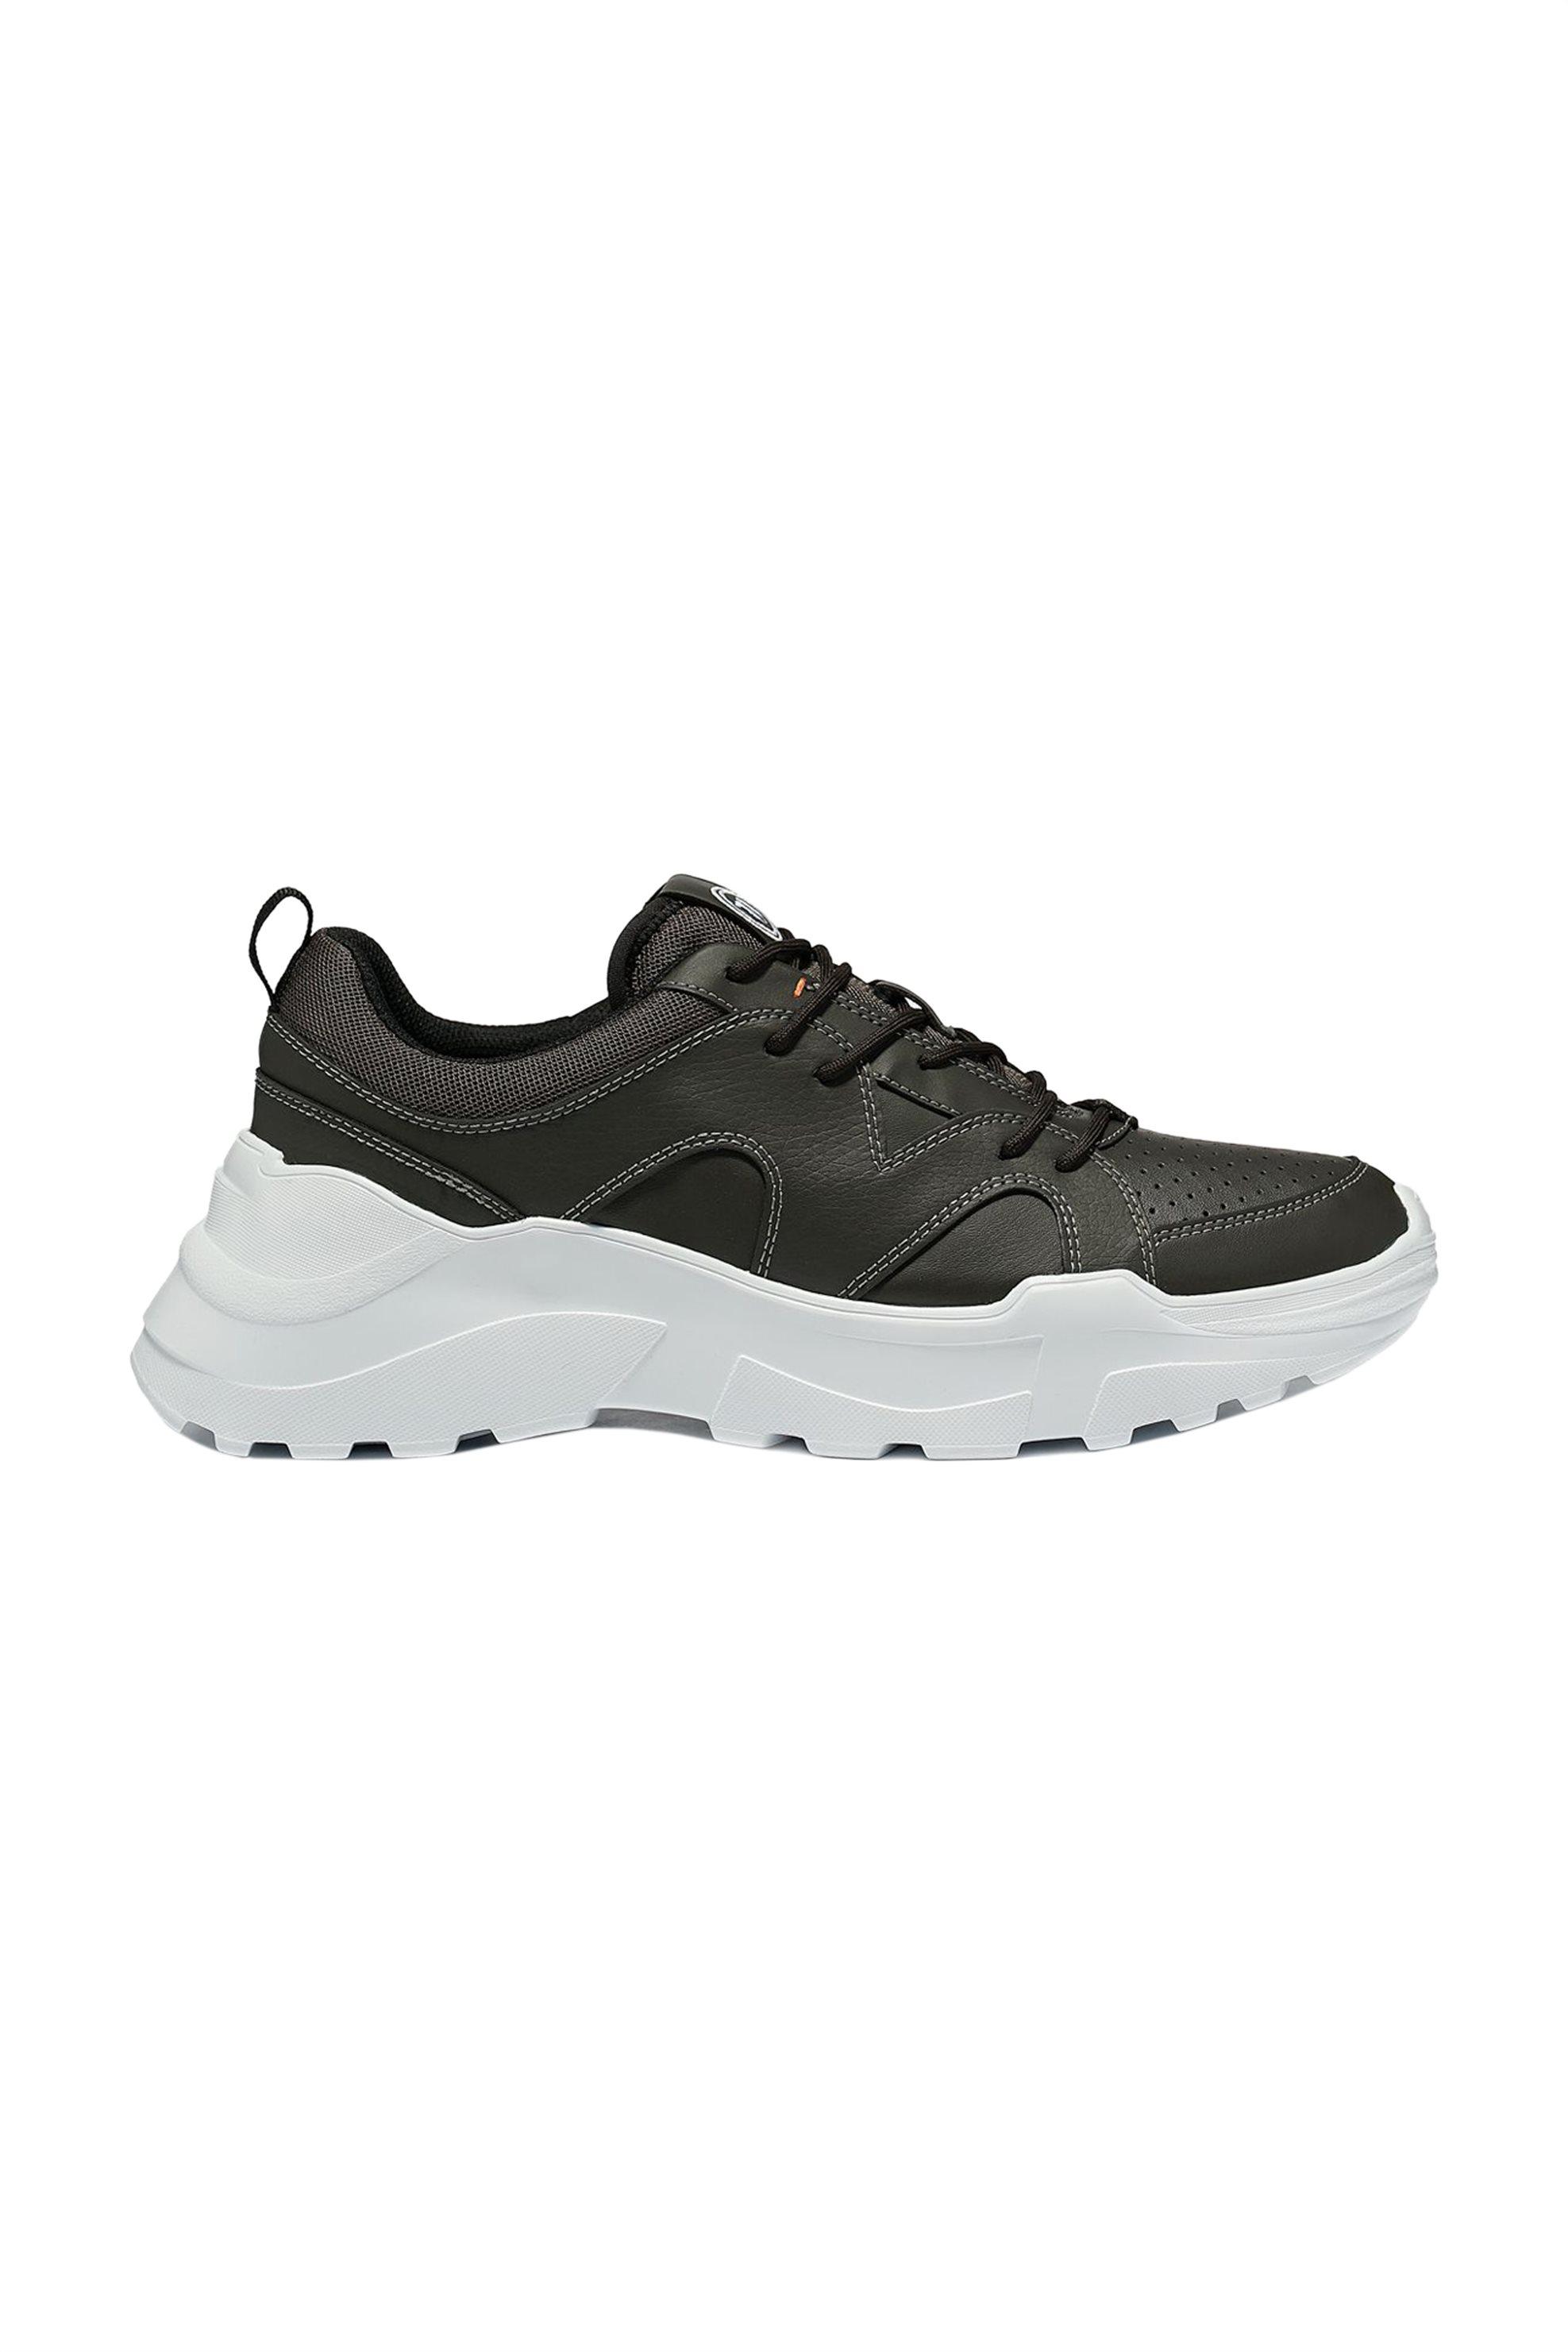 Trussardi ανδρικά sneakers με διαφορετικές υφές – 77A00196-9Y099999 – Χακί